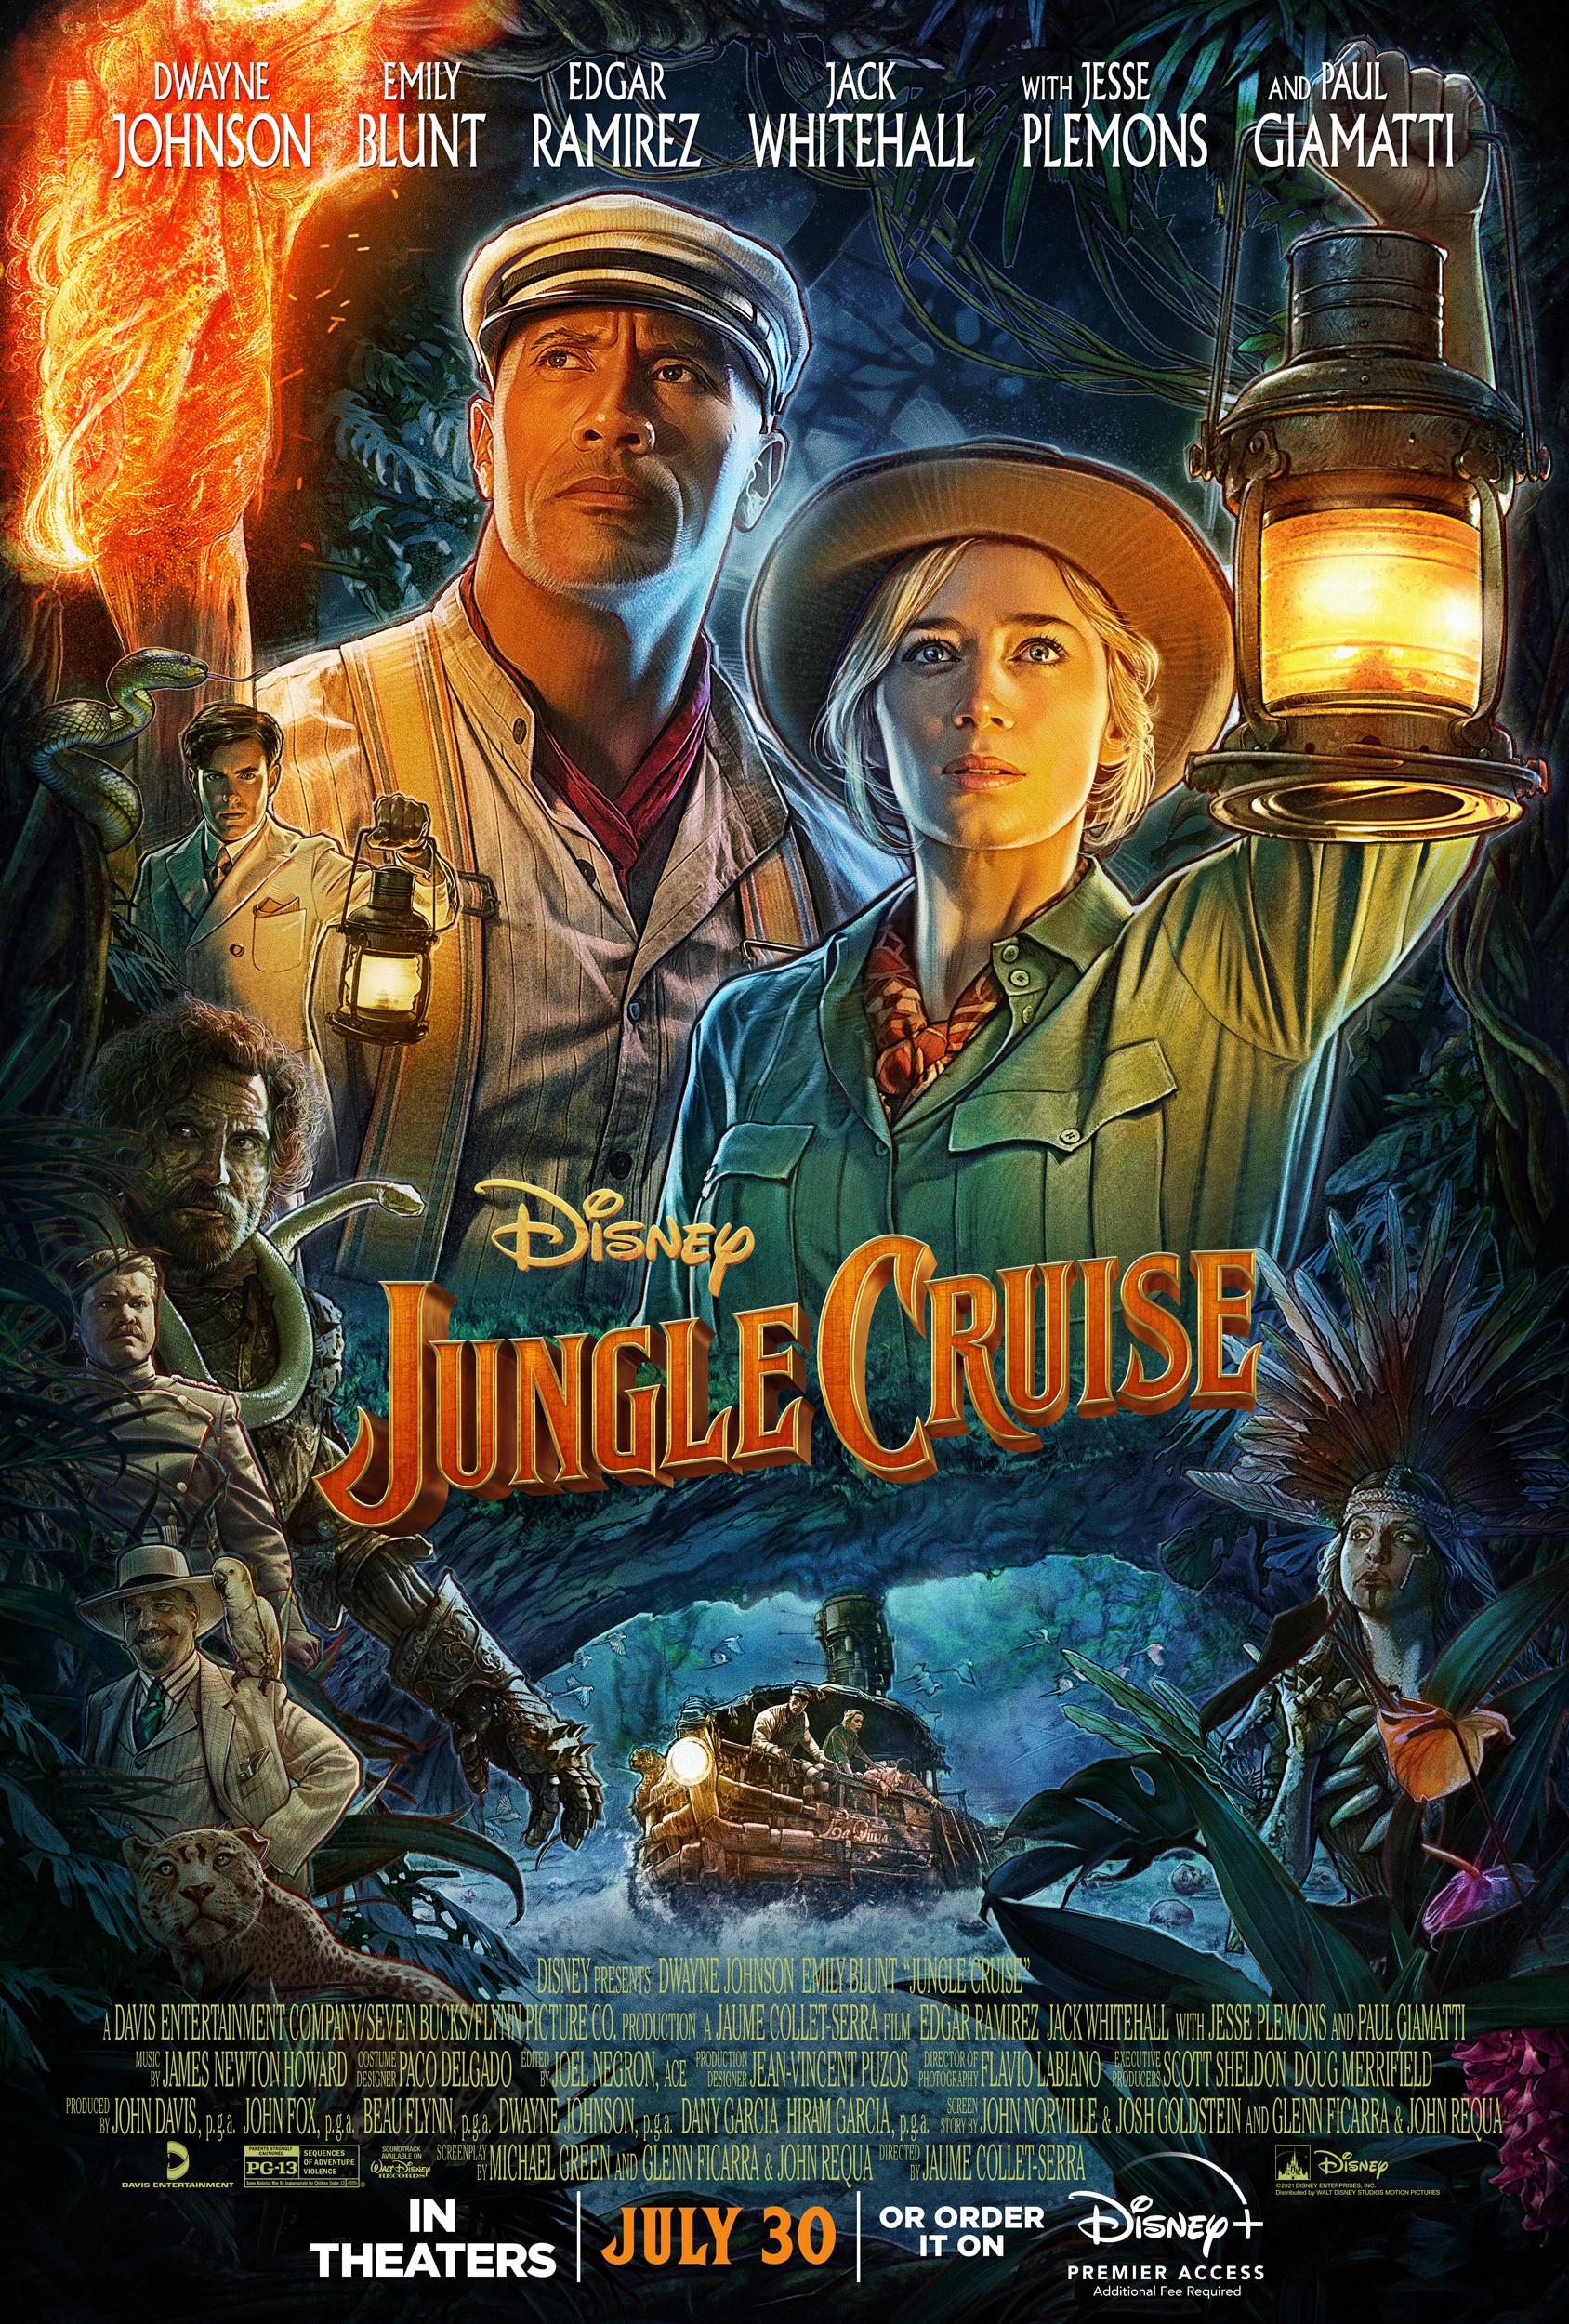 jungle-cruise-dwayne-johnson-emily-blunt-movie-poster